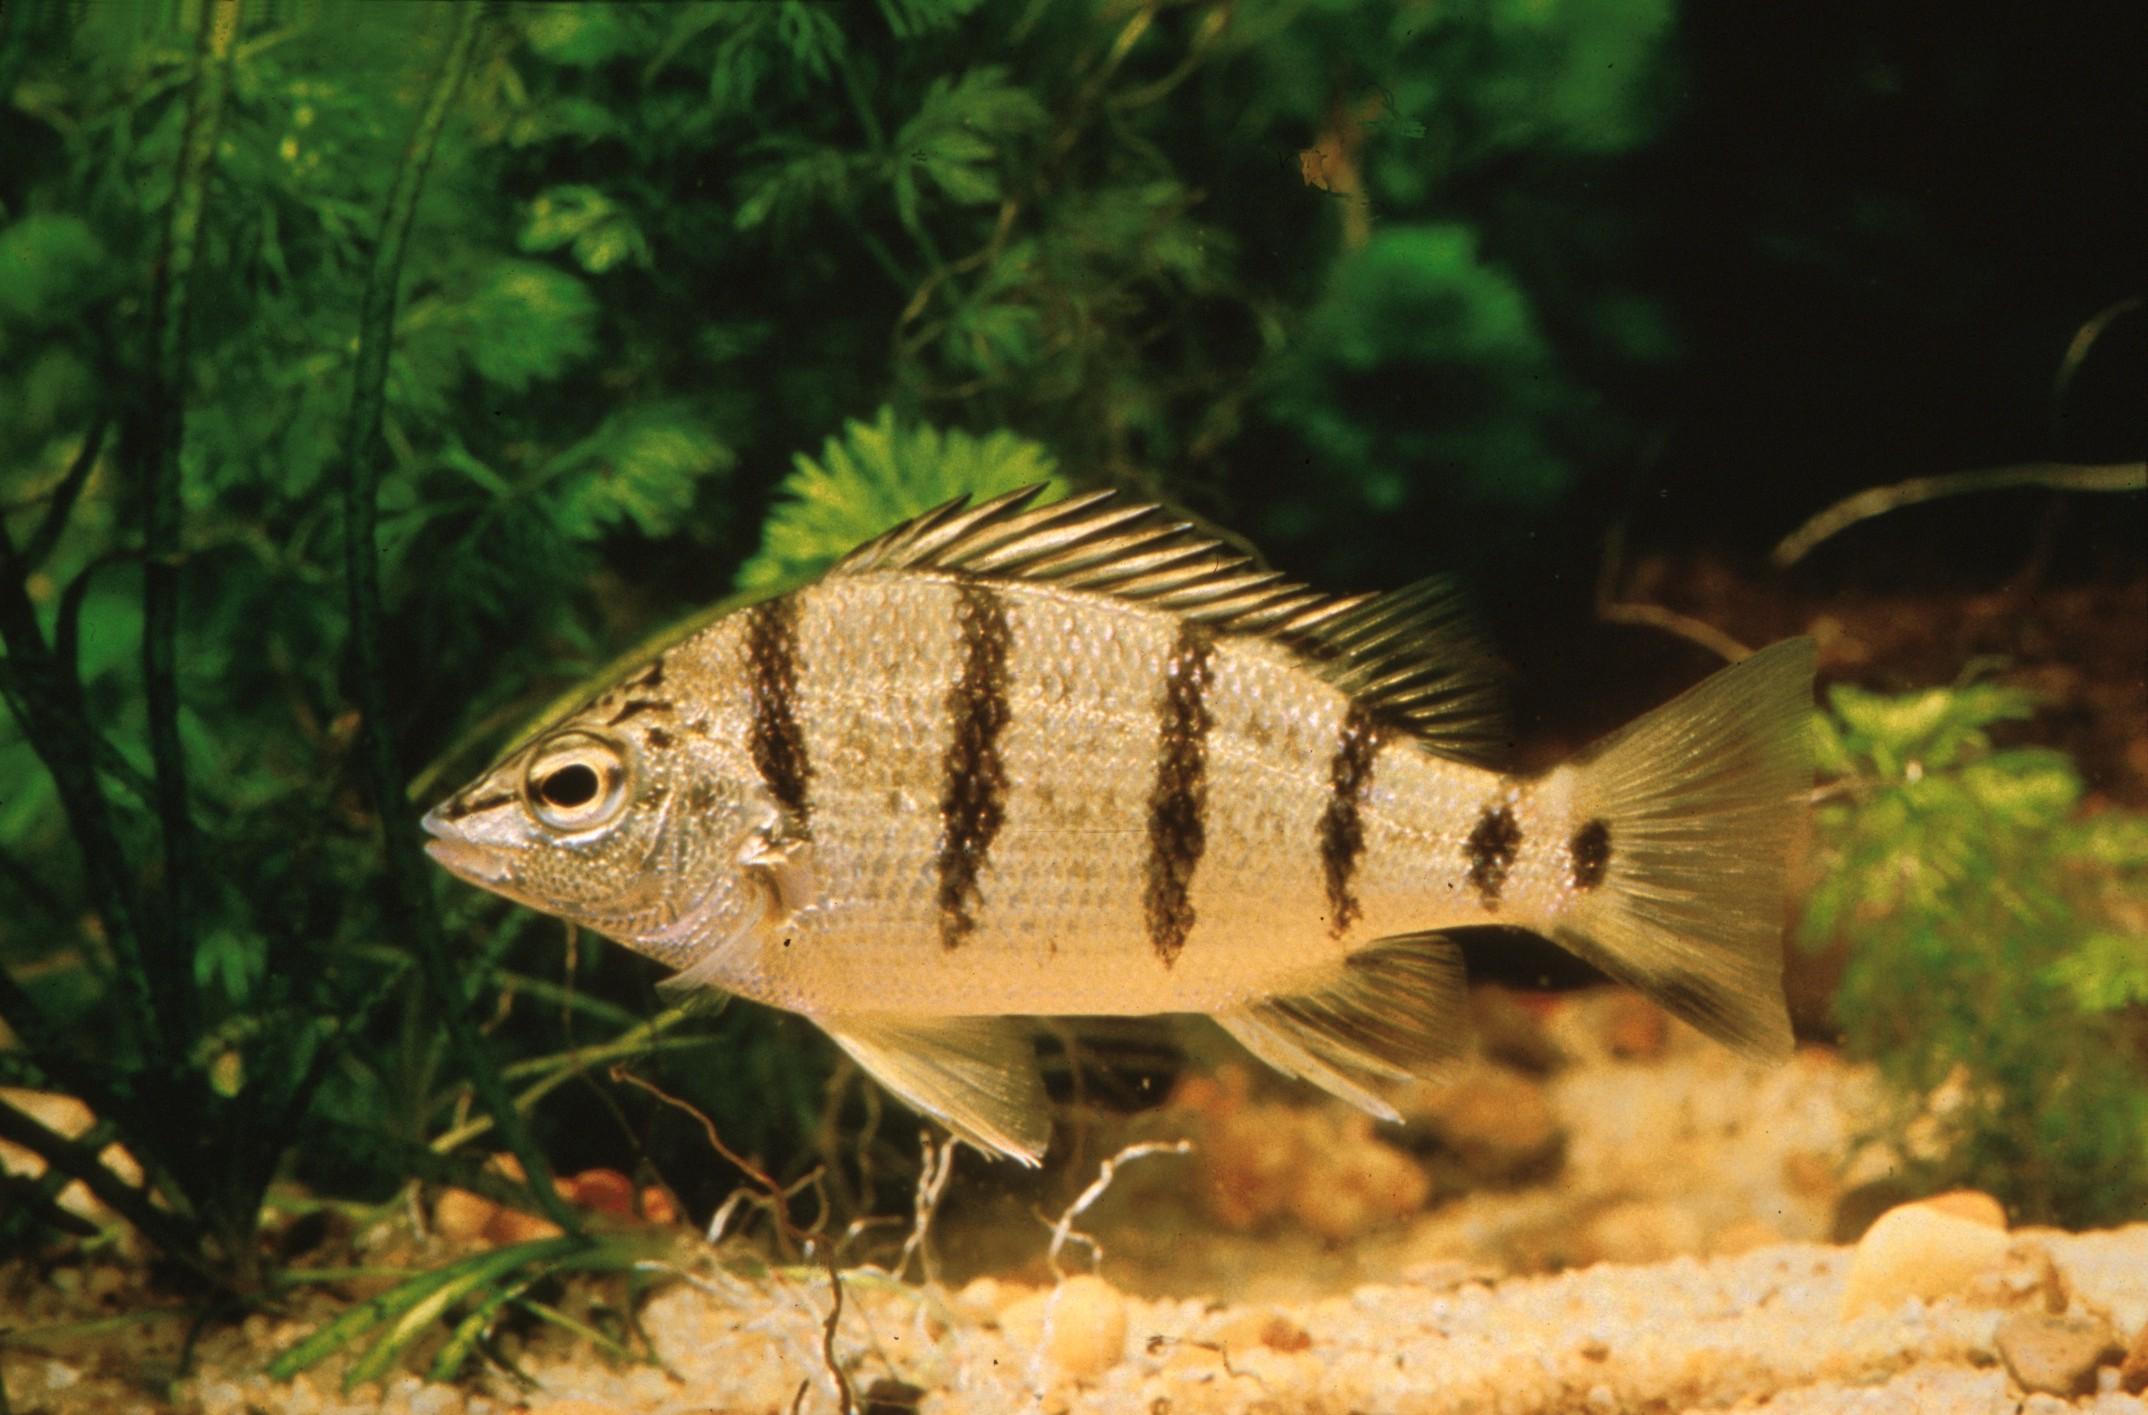 Amniataba percoides (Banded Grunter)